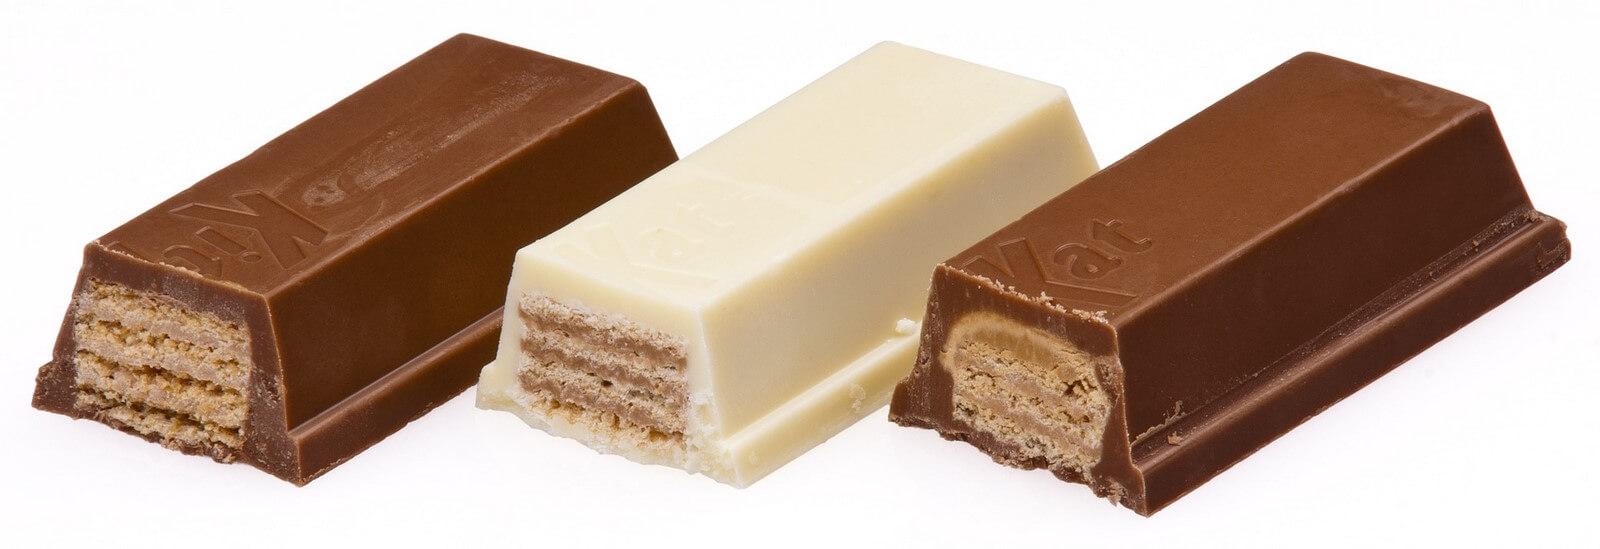 kitkat chocolate gifts israel